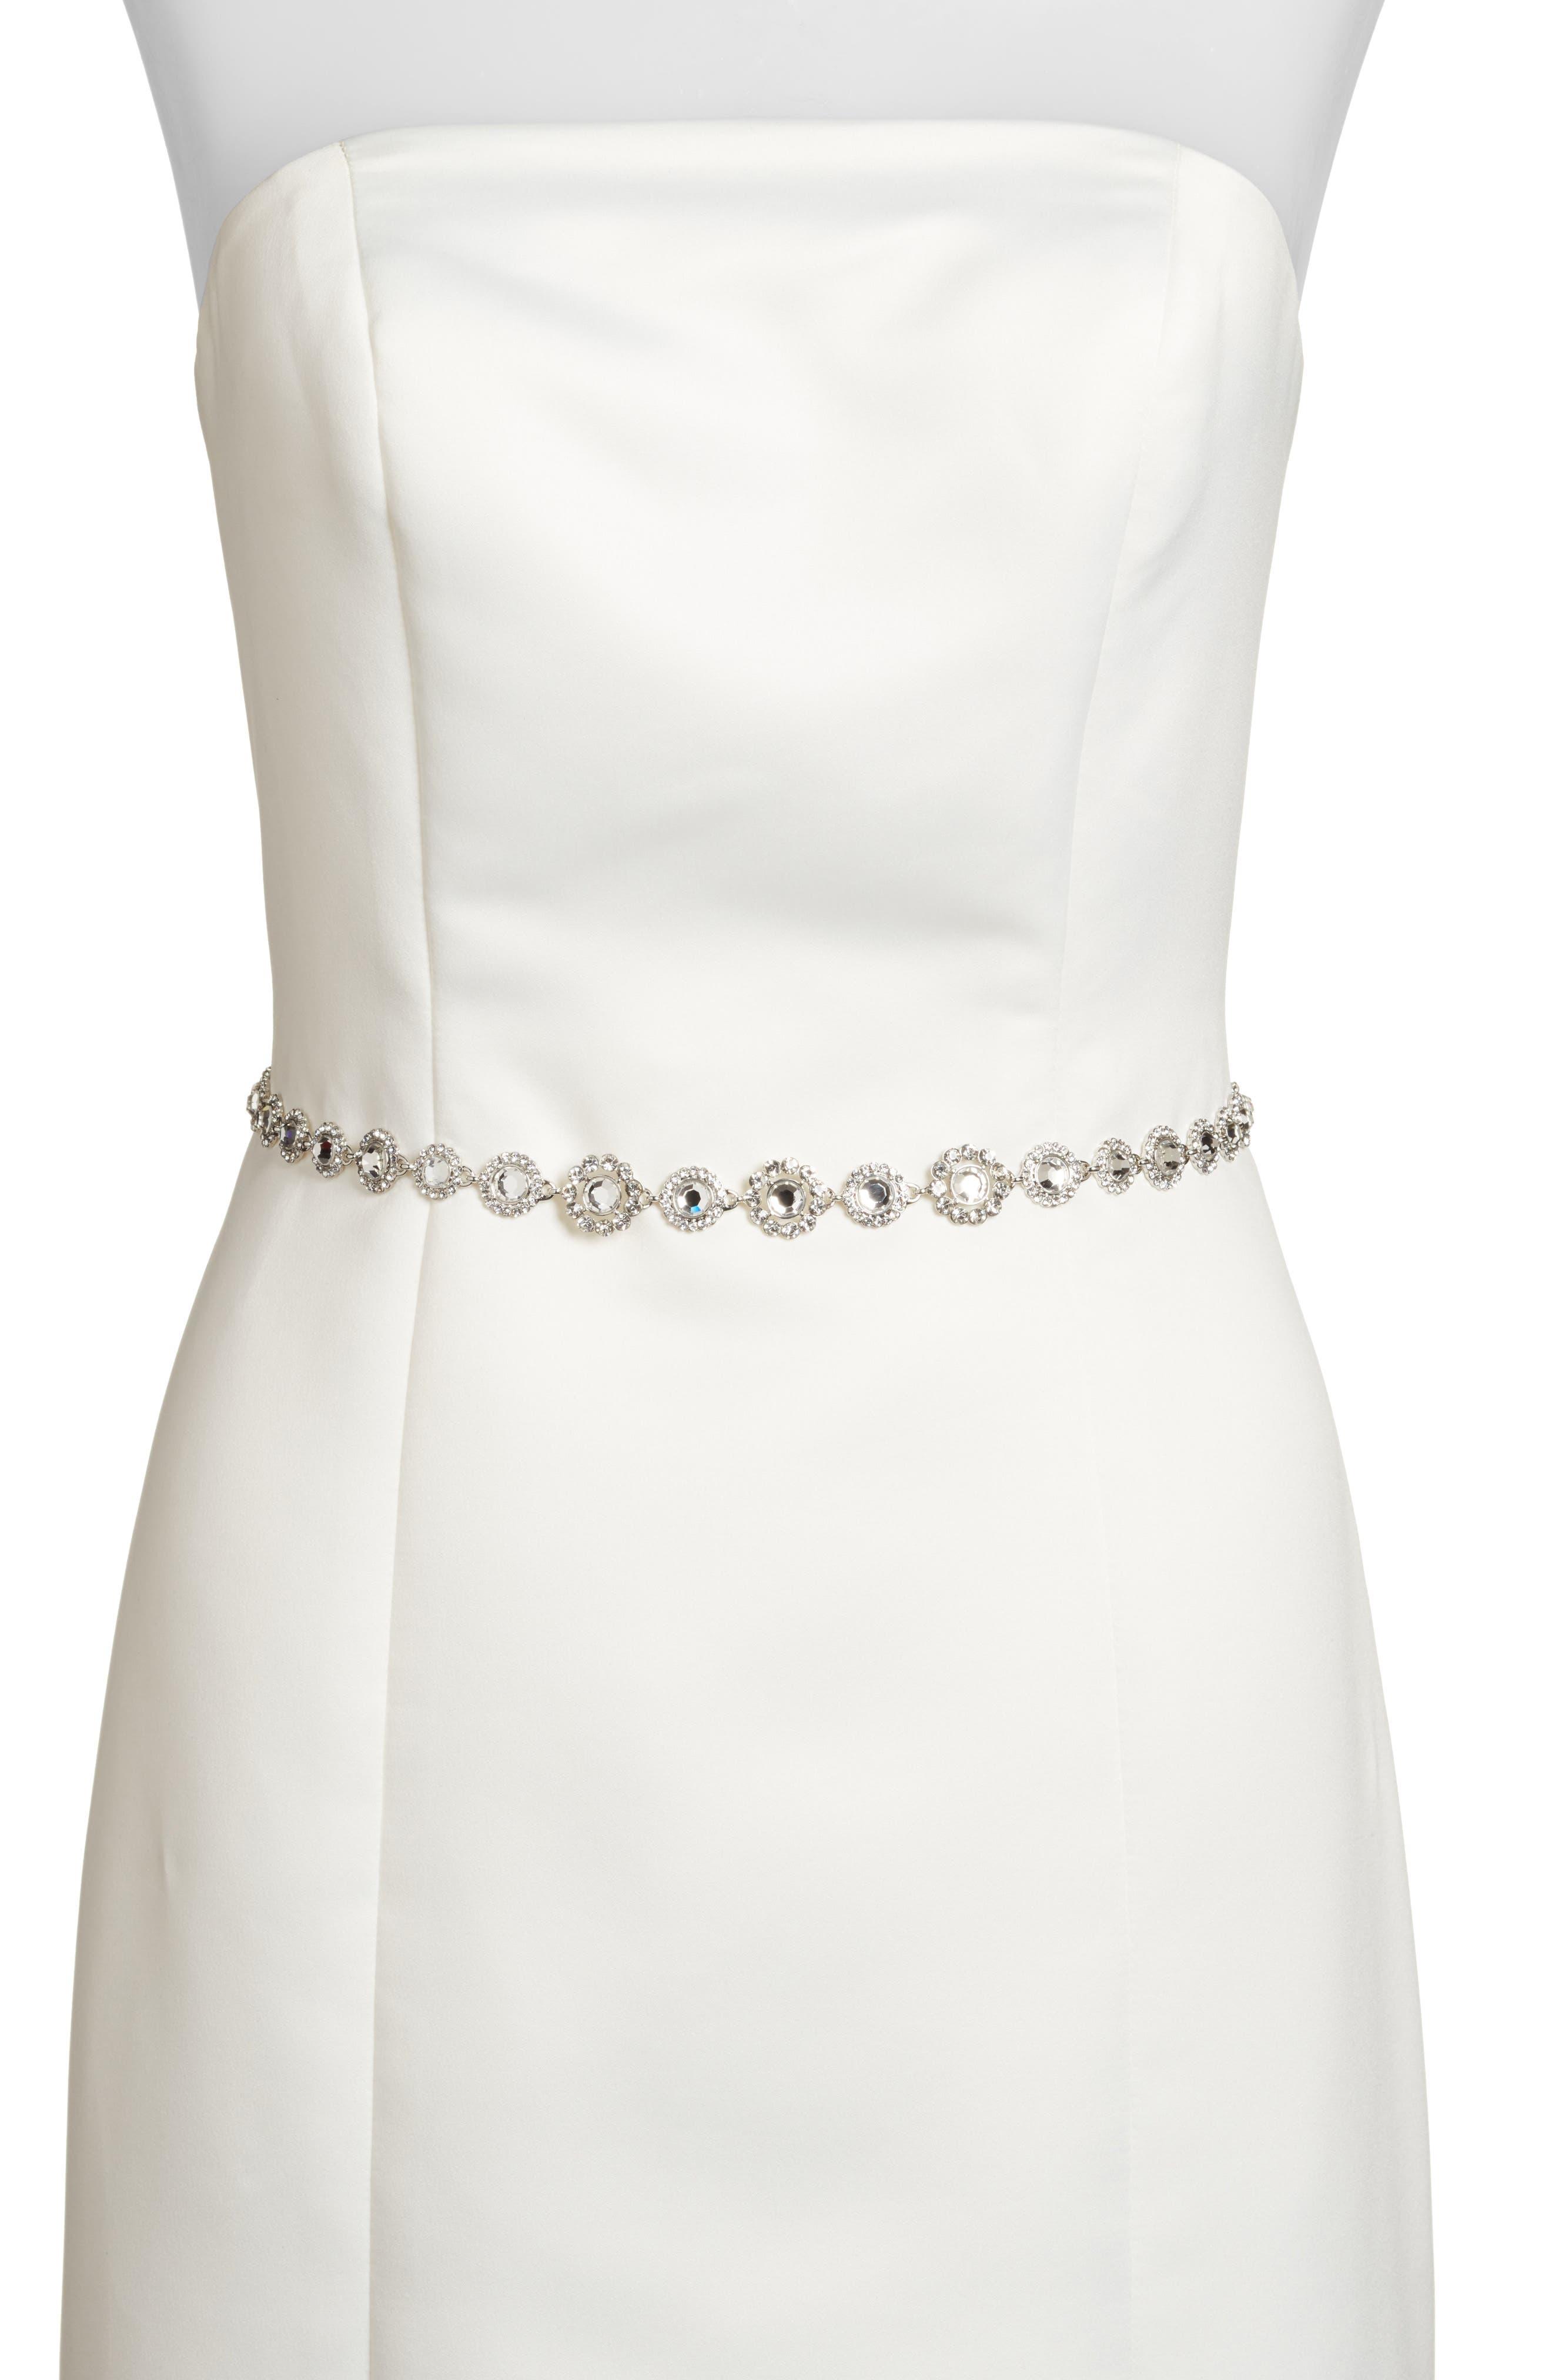 Kate Spade New York Crystal Bridal Belt, Silver